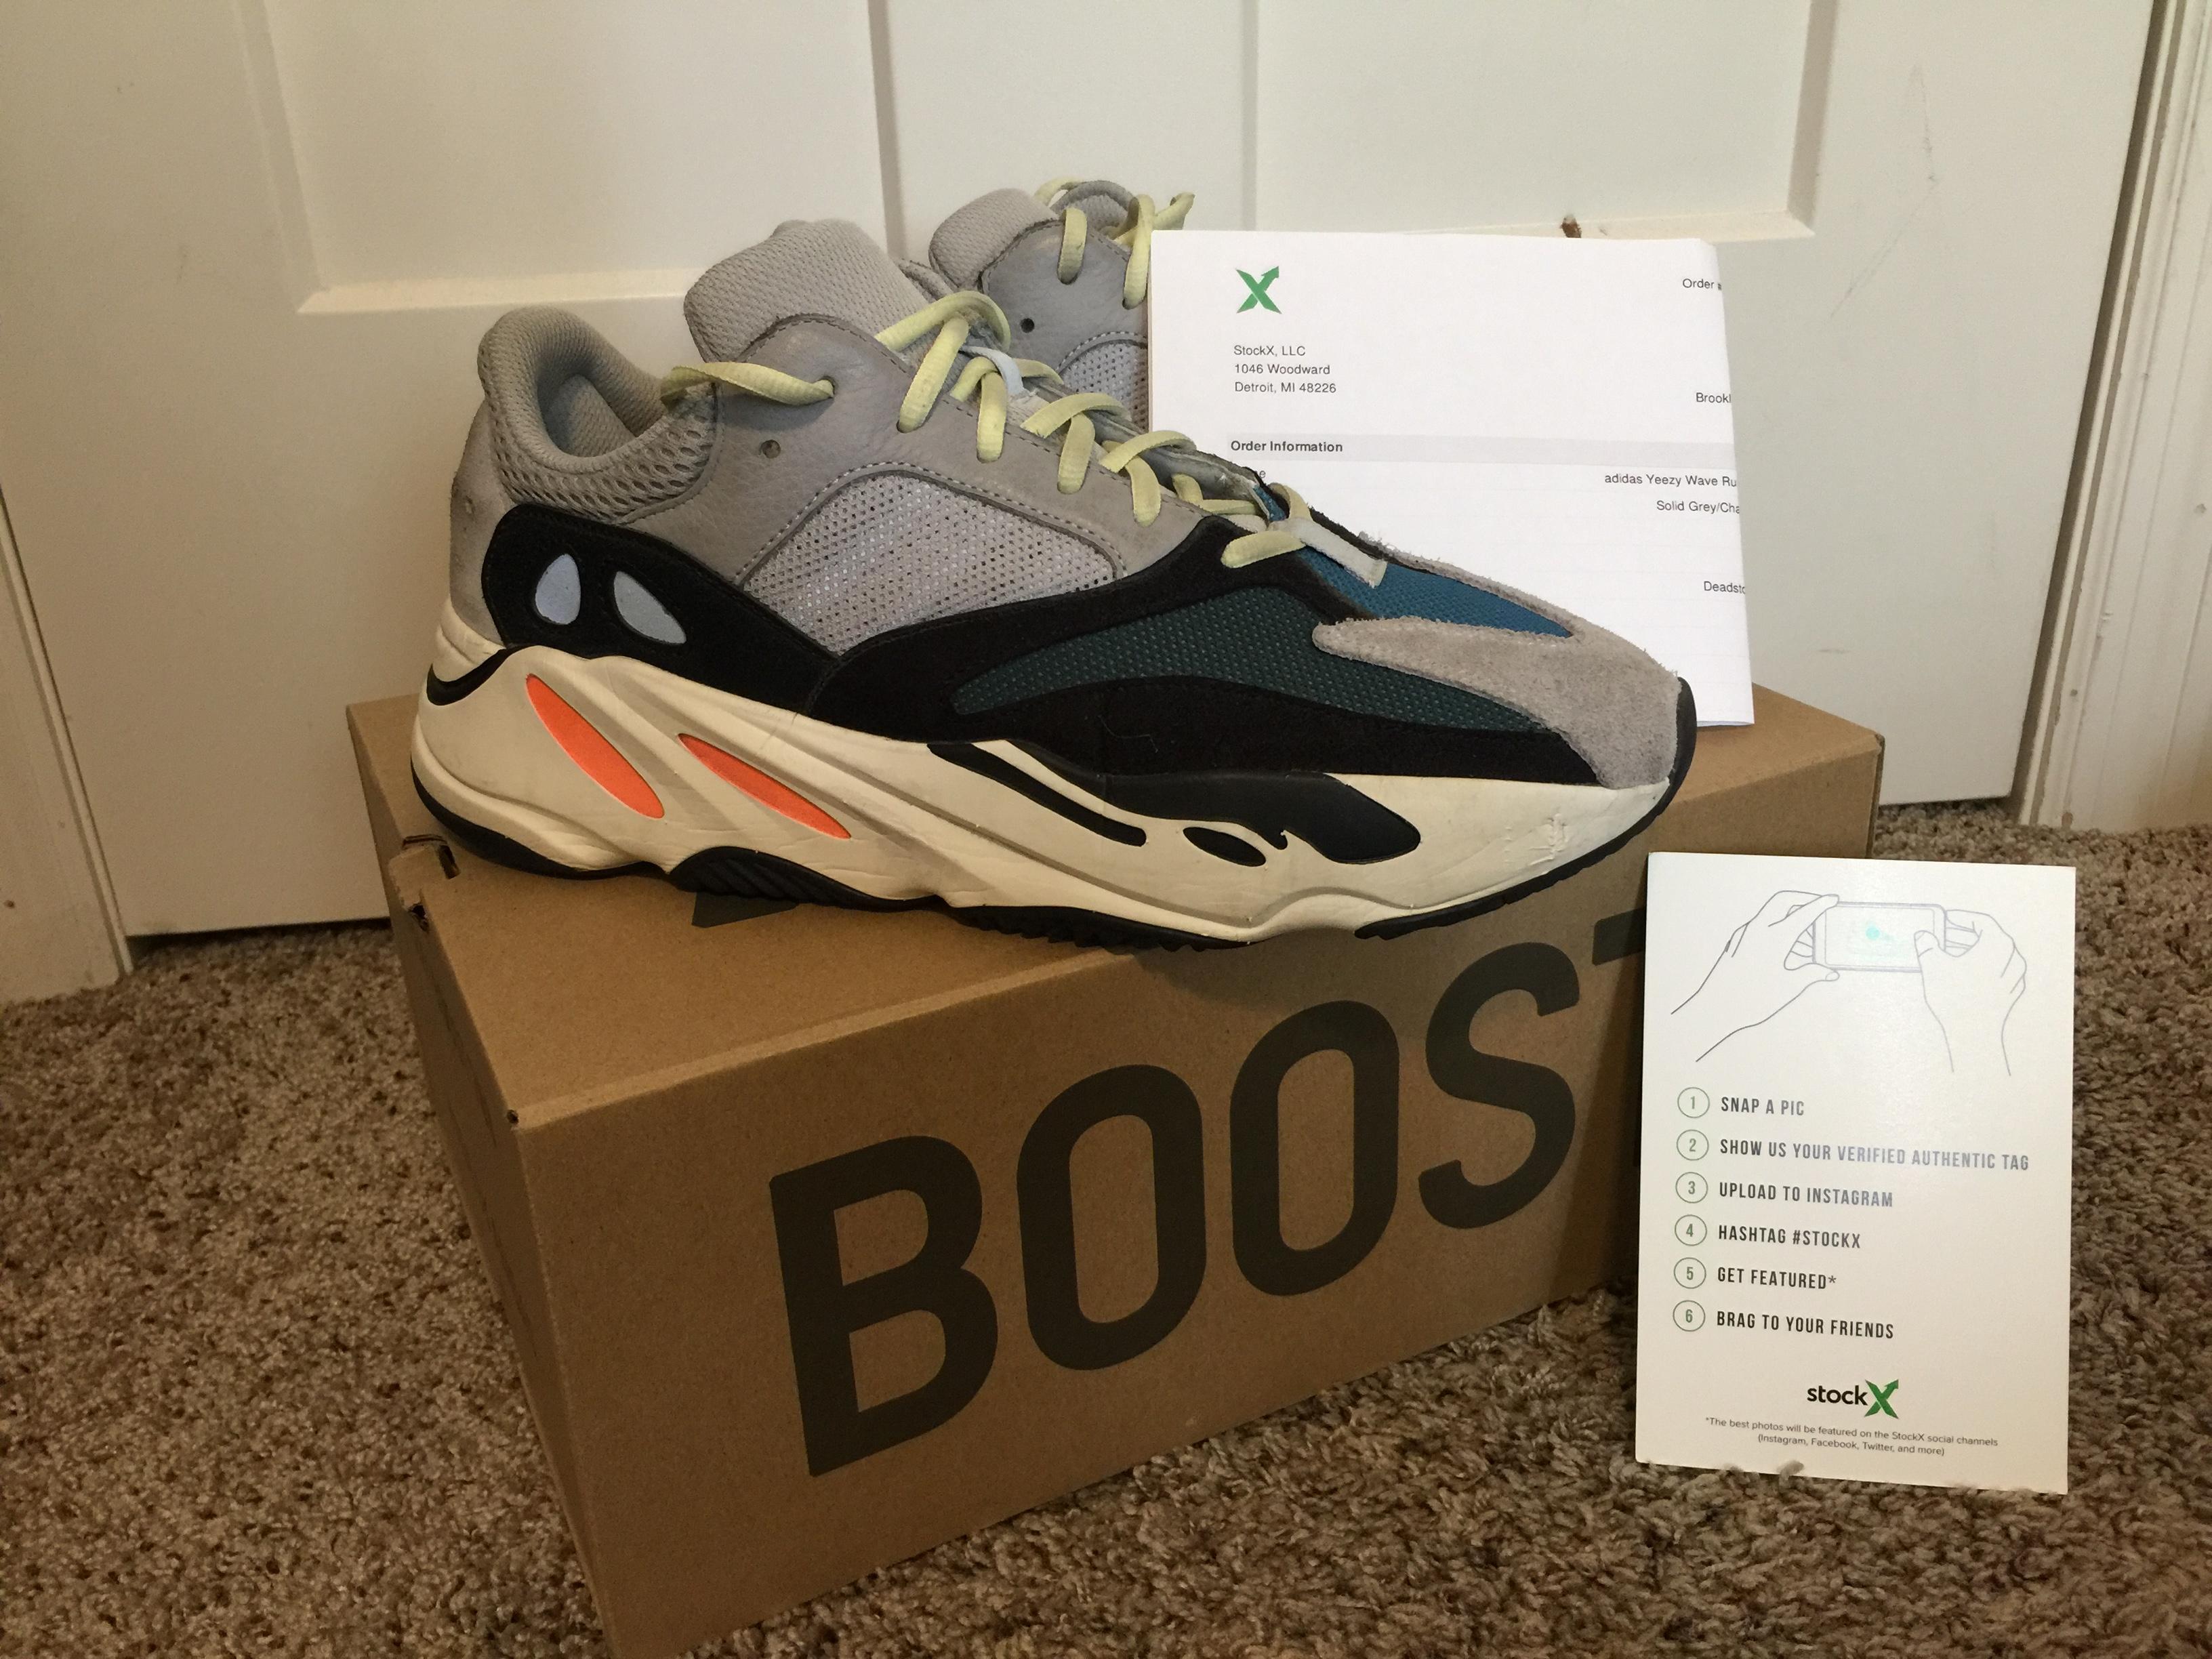 b79889de2 Adidas × Adidas Kanye West × Yeezy Season. (STEAL!) Yeezy Boost Wave Runner  700 Solid Grey. Size  US 11.5 ...